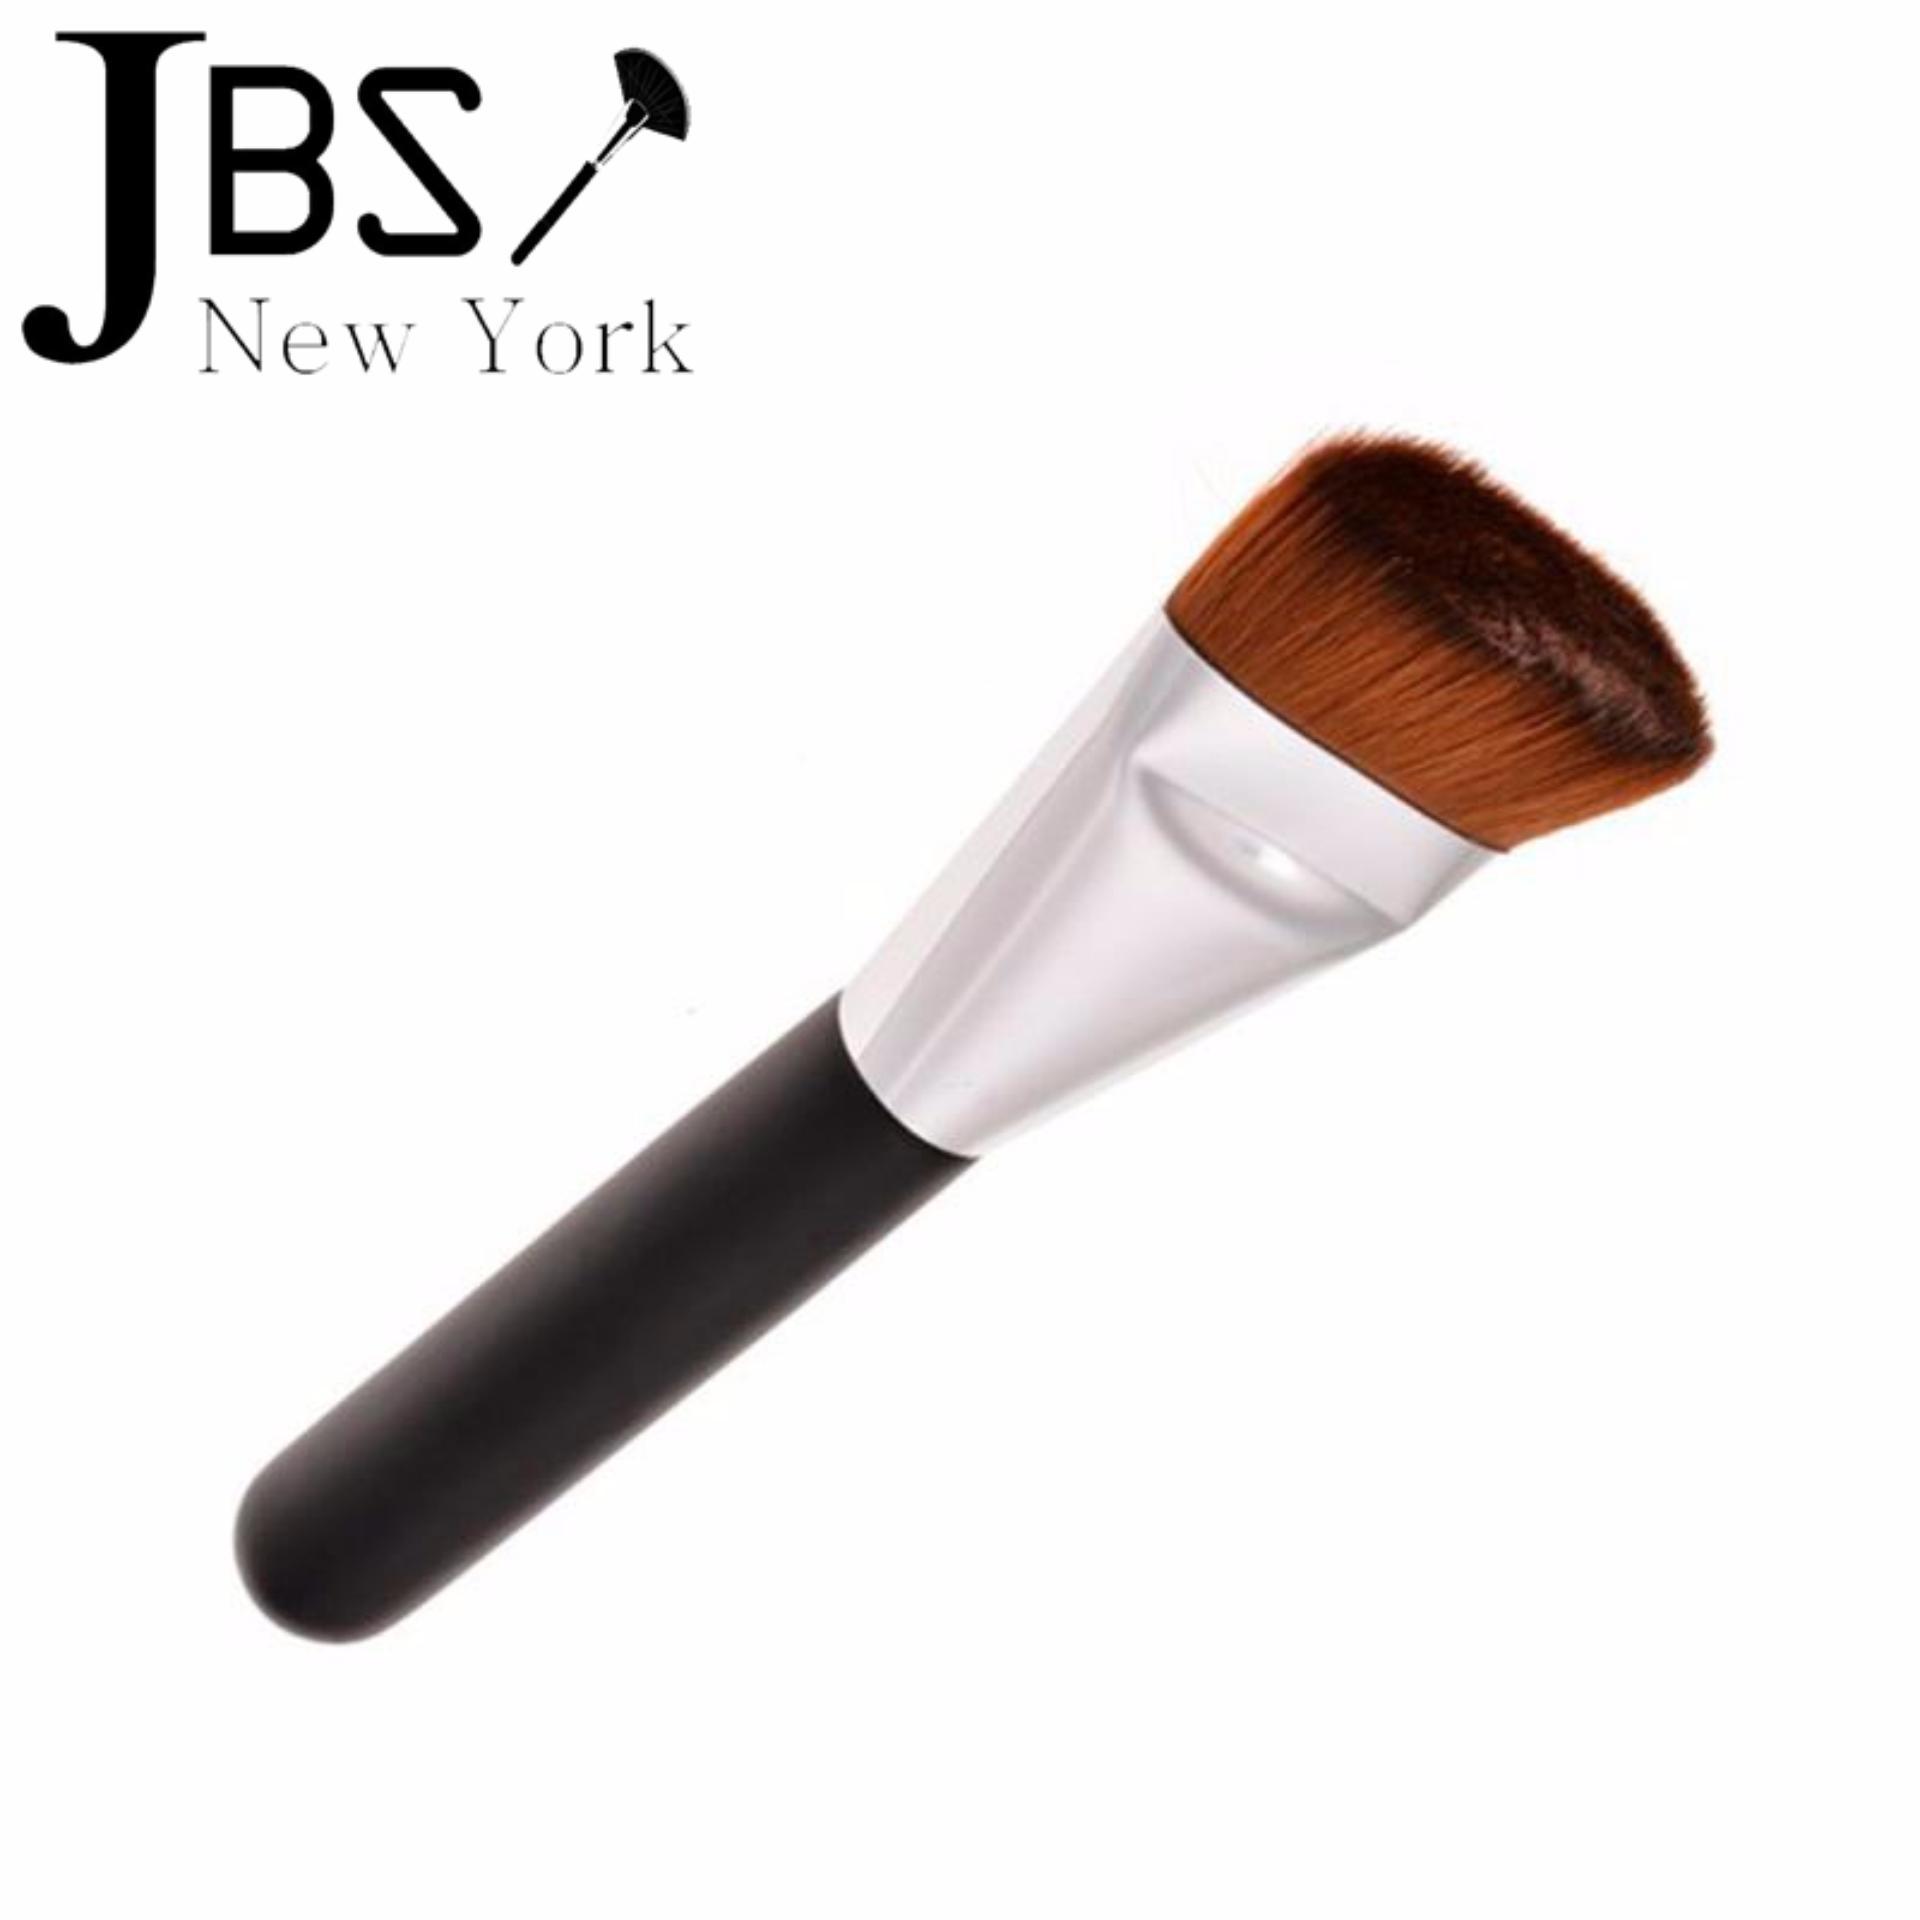 Kelebihan Jbs New York Set Brush Makeup Contour Silver Bundle Kuas Paket K 070 Egg Spon Telur Beauty K027 3